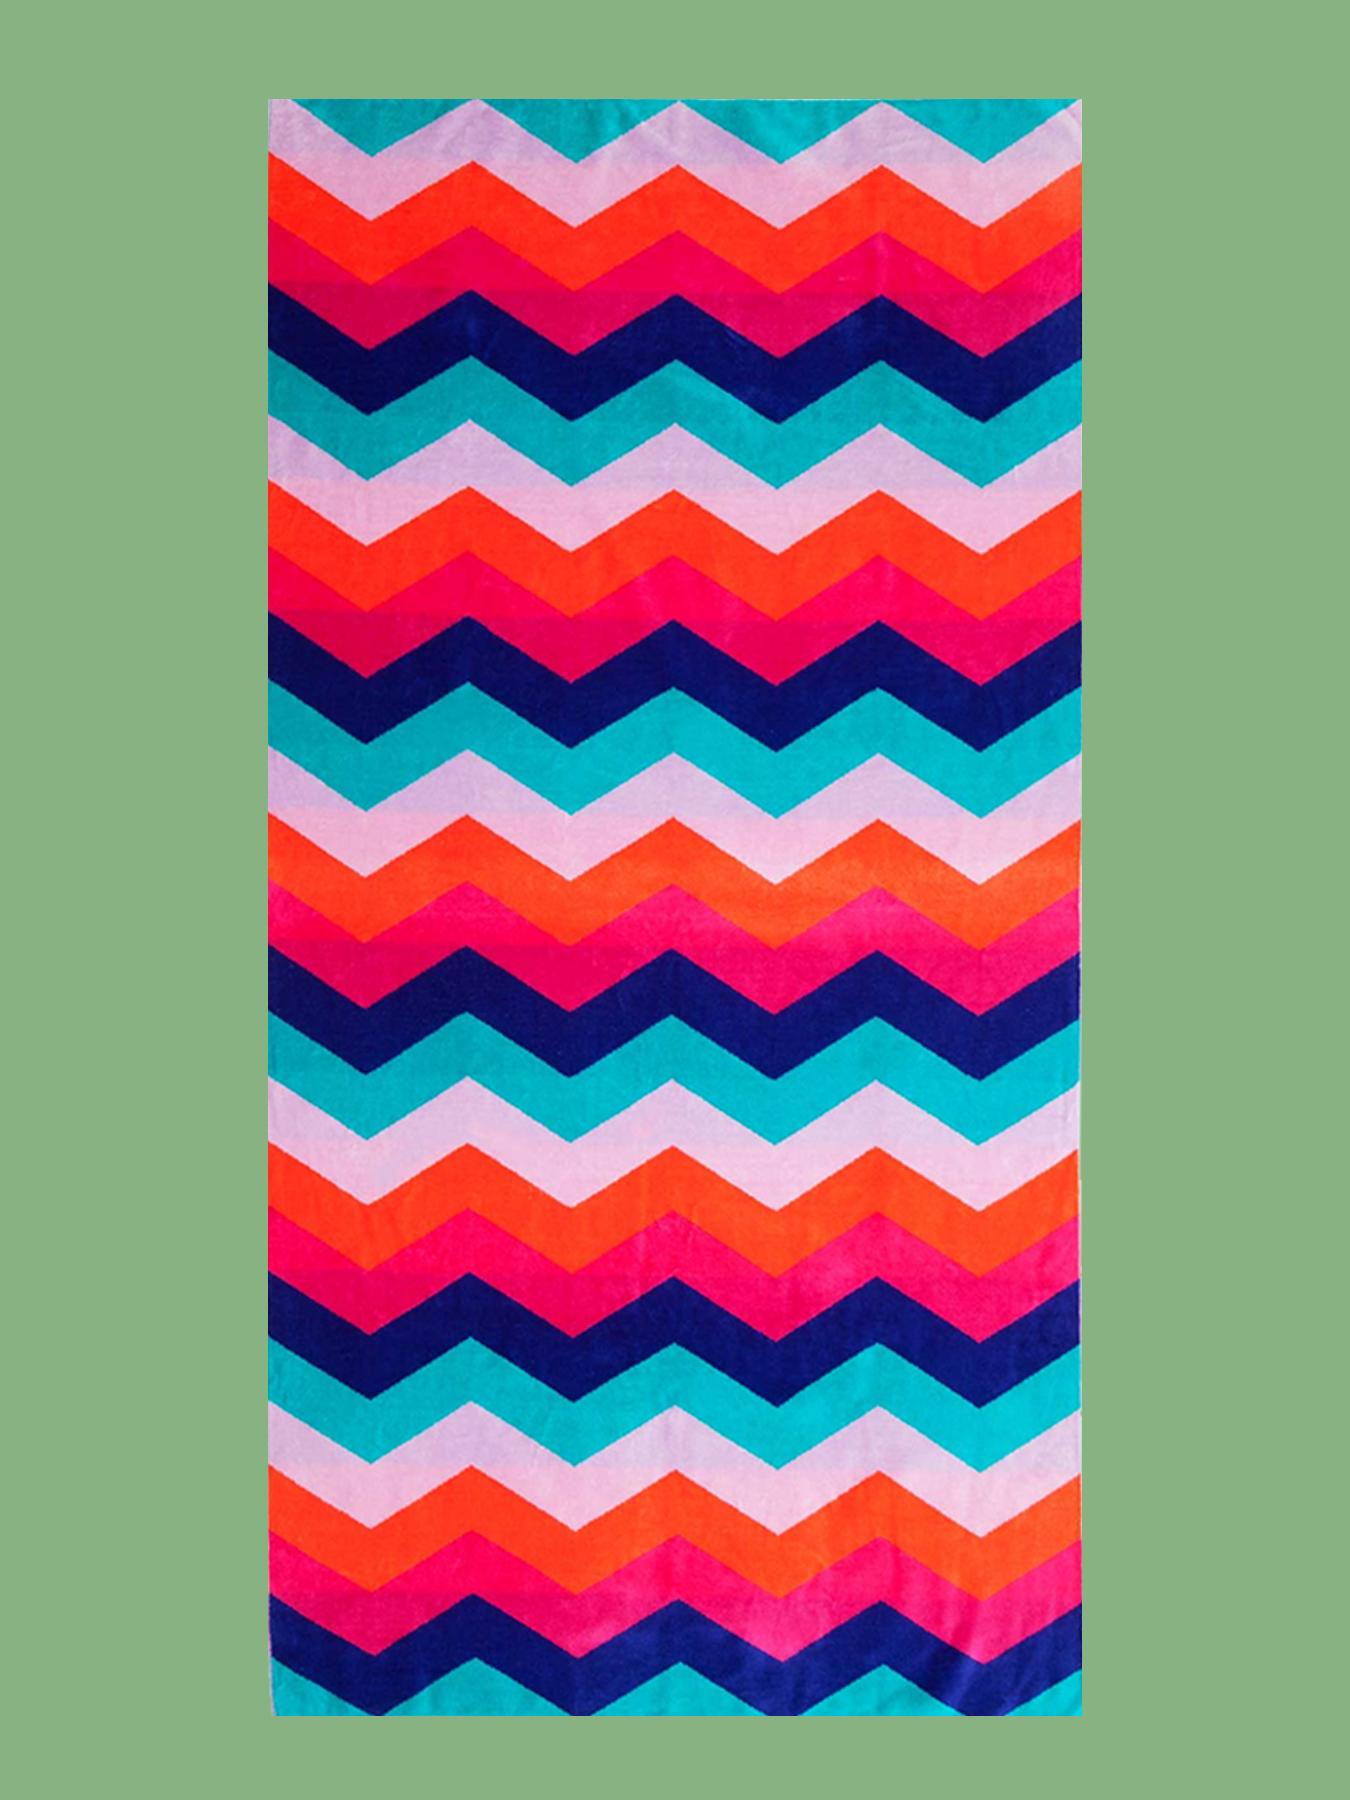 BEACH TOWEL: Zig Zag Towel